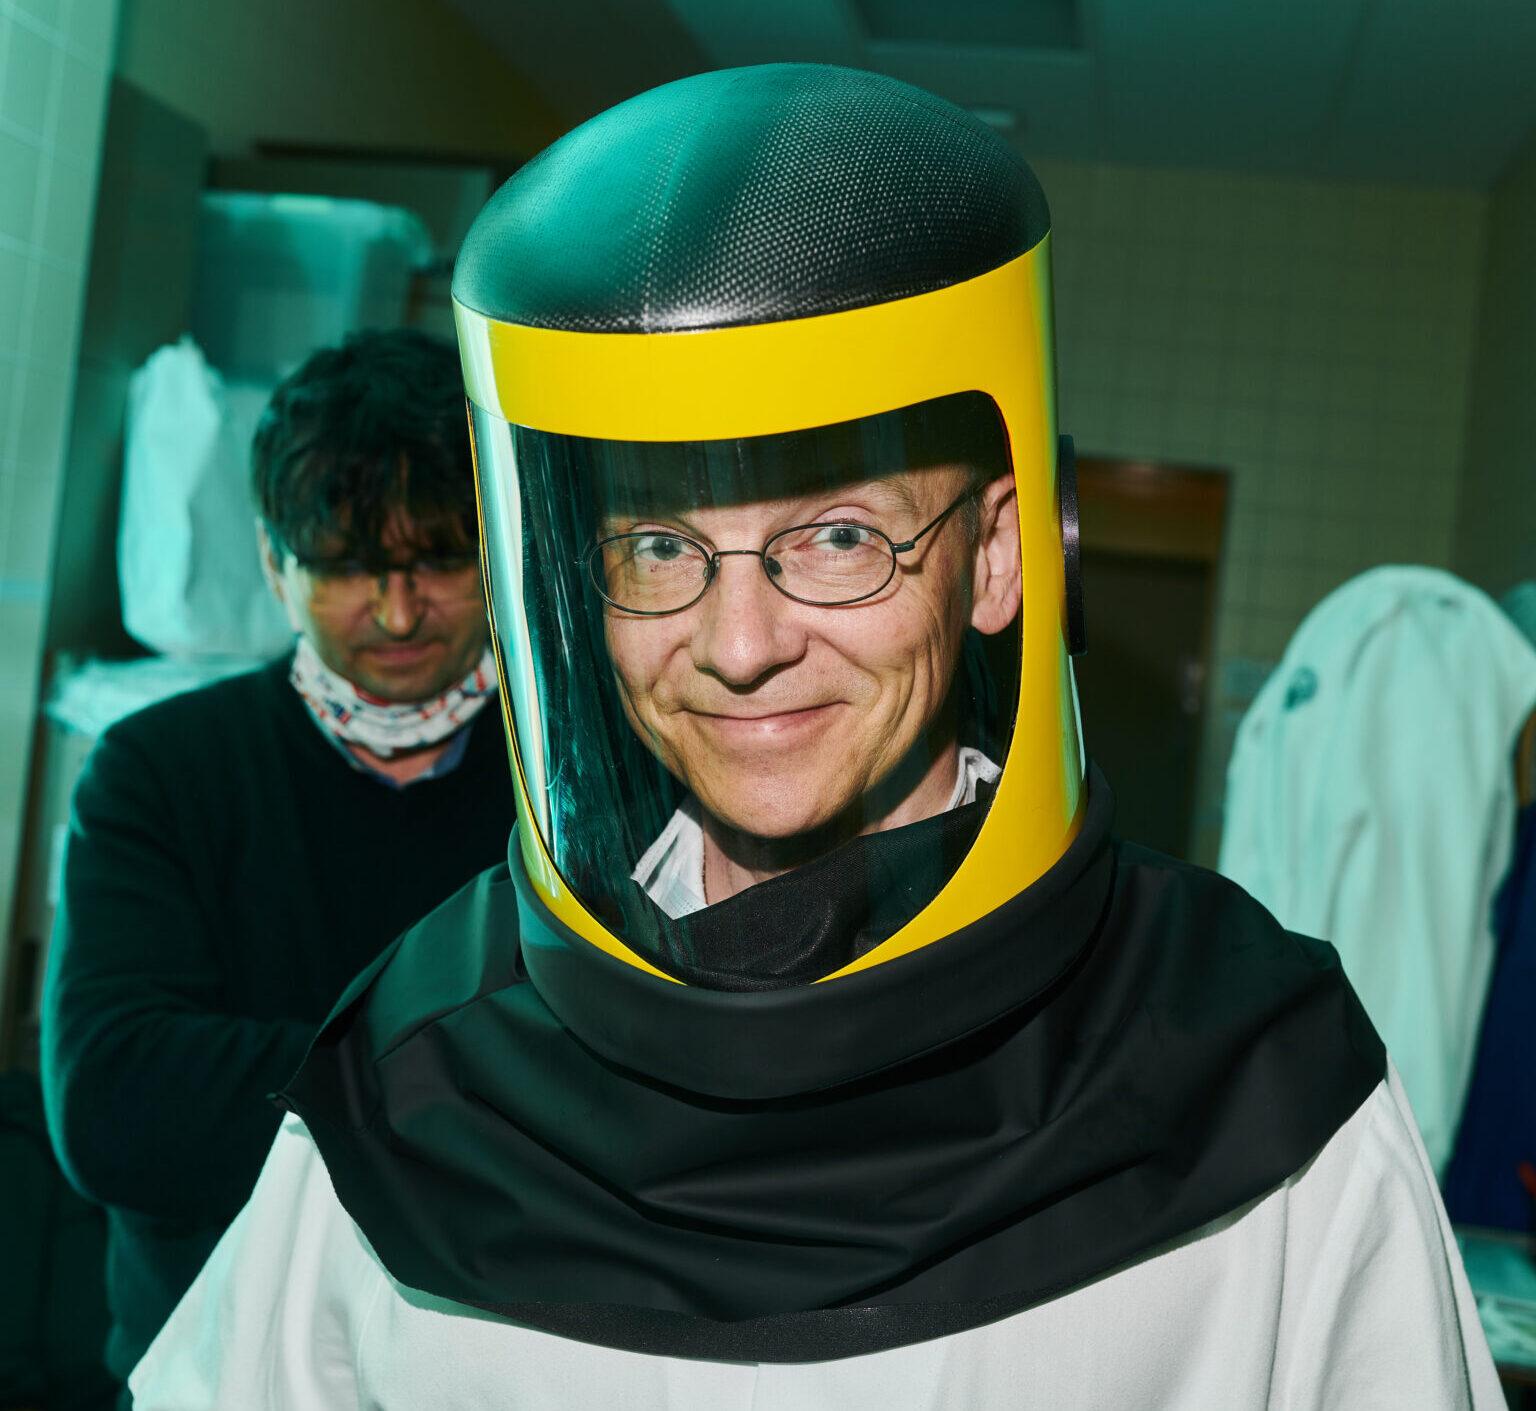 A composite medical protective helmet